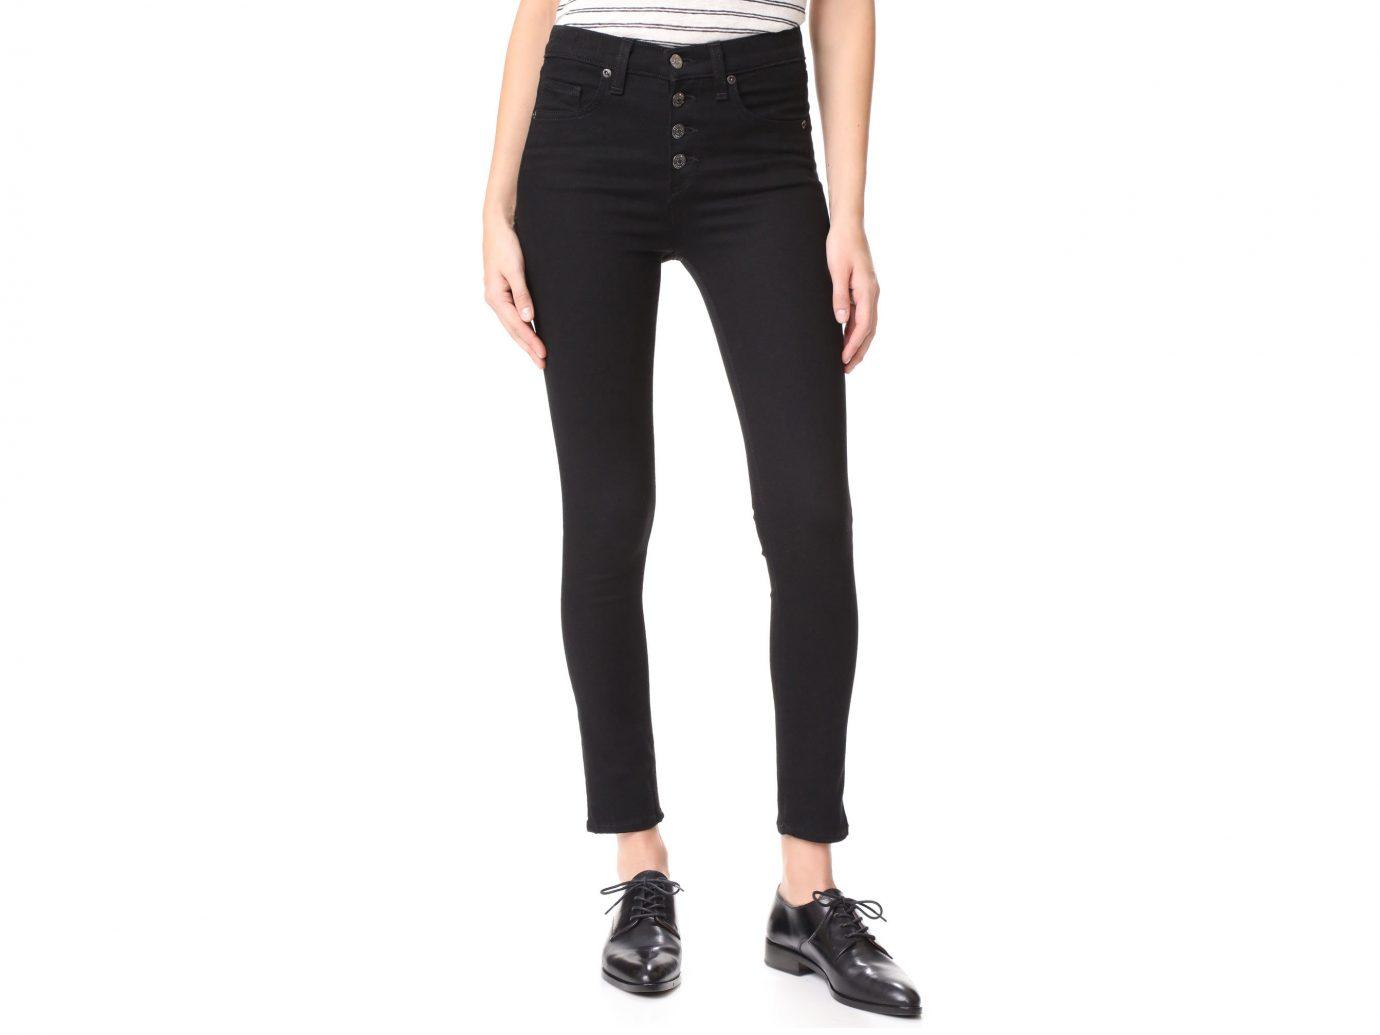 Influencers + Tastemakers Travel Shop Trip Ideas clothing trouser jeans waist denim joint leggings trousers active pants tights human leg abdomen trunk fashion model pocket